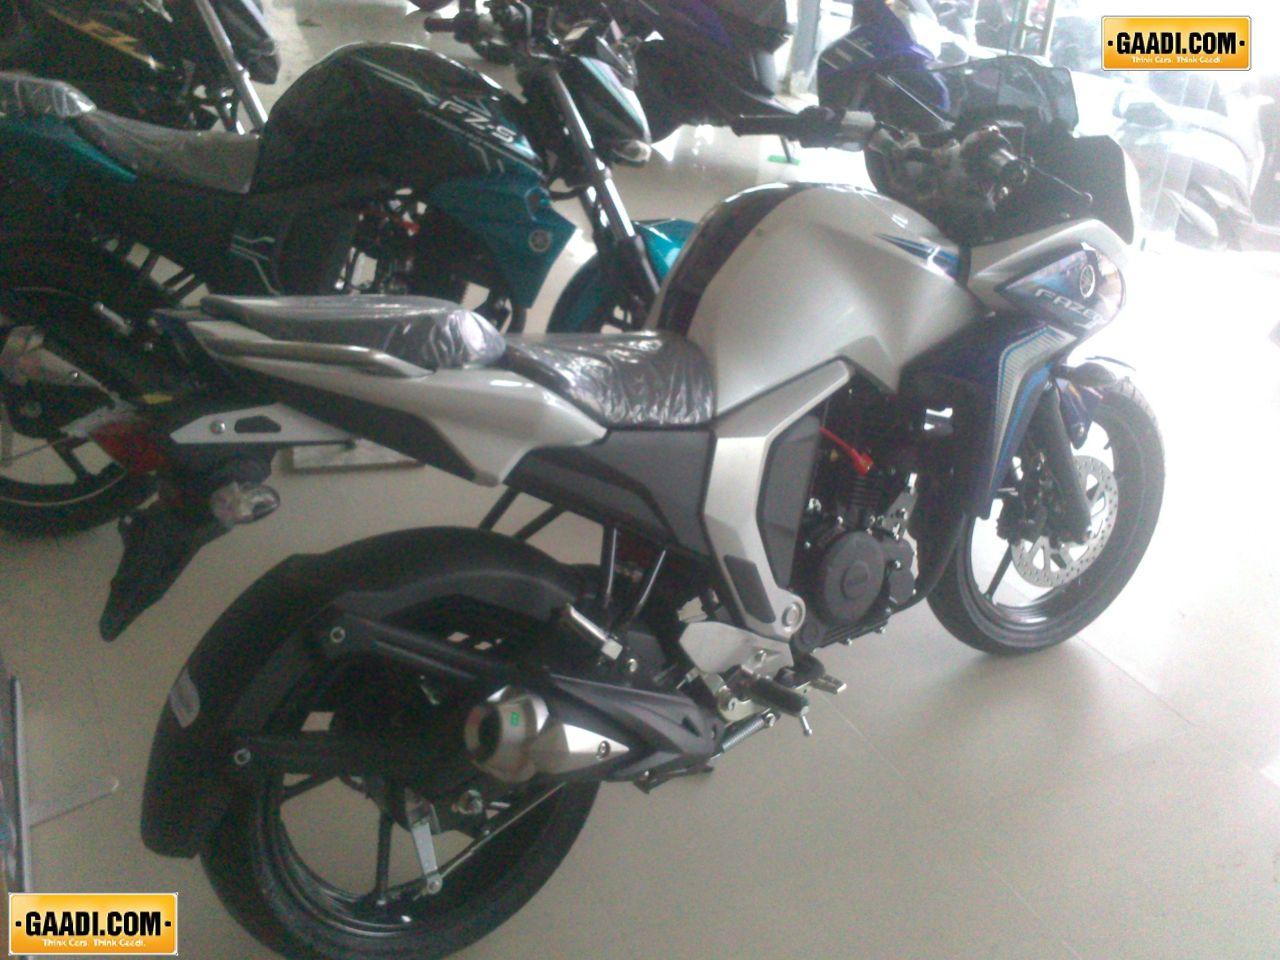 Yamaha Fazer FI 20 Spotted At Gurgaon Dealership Priced